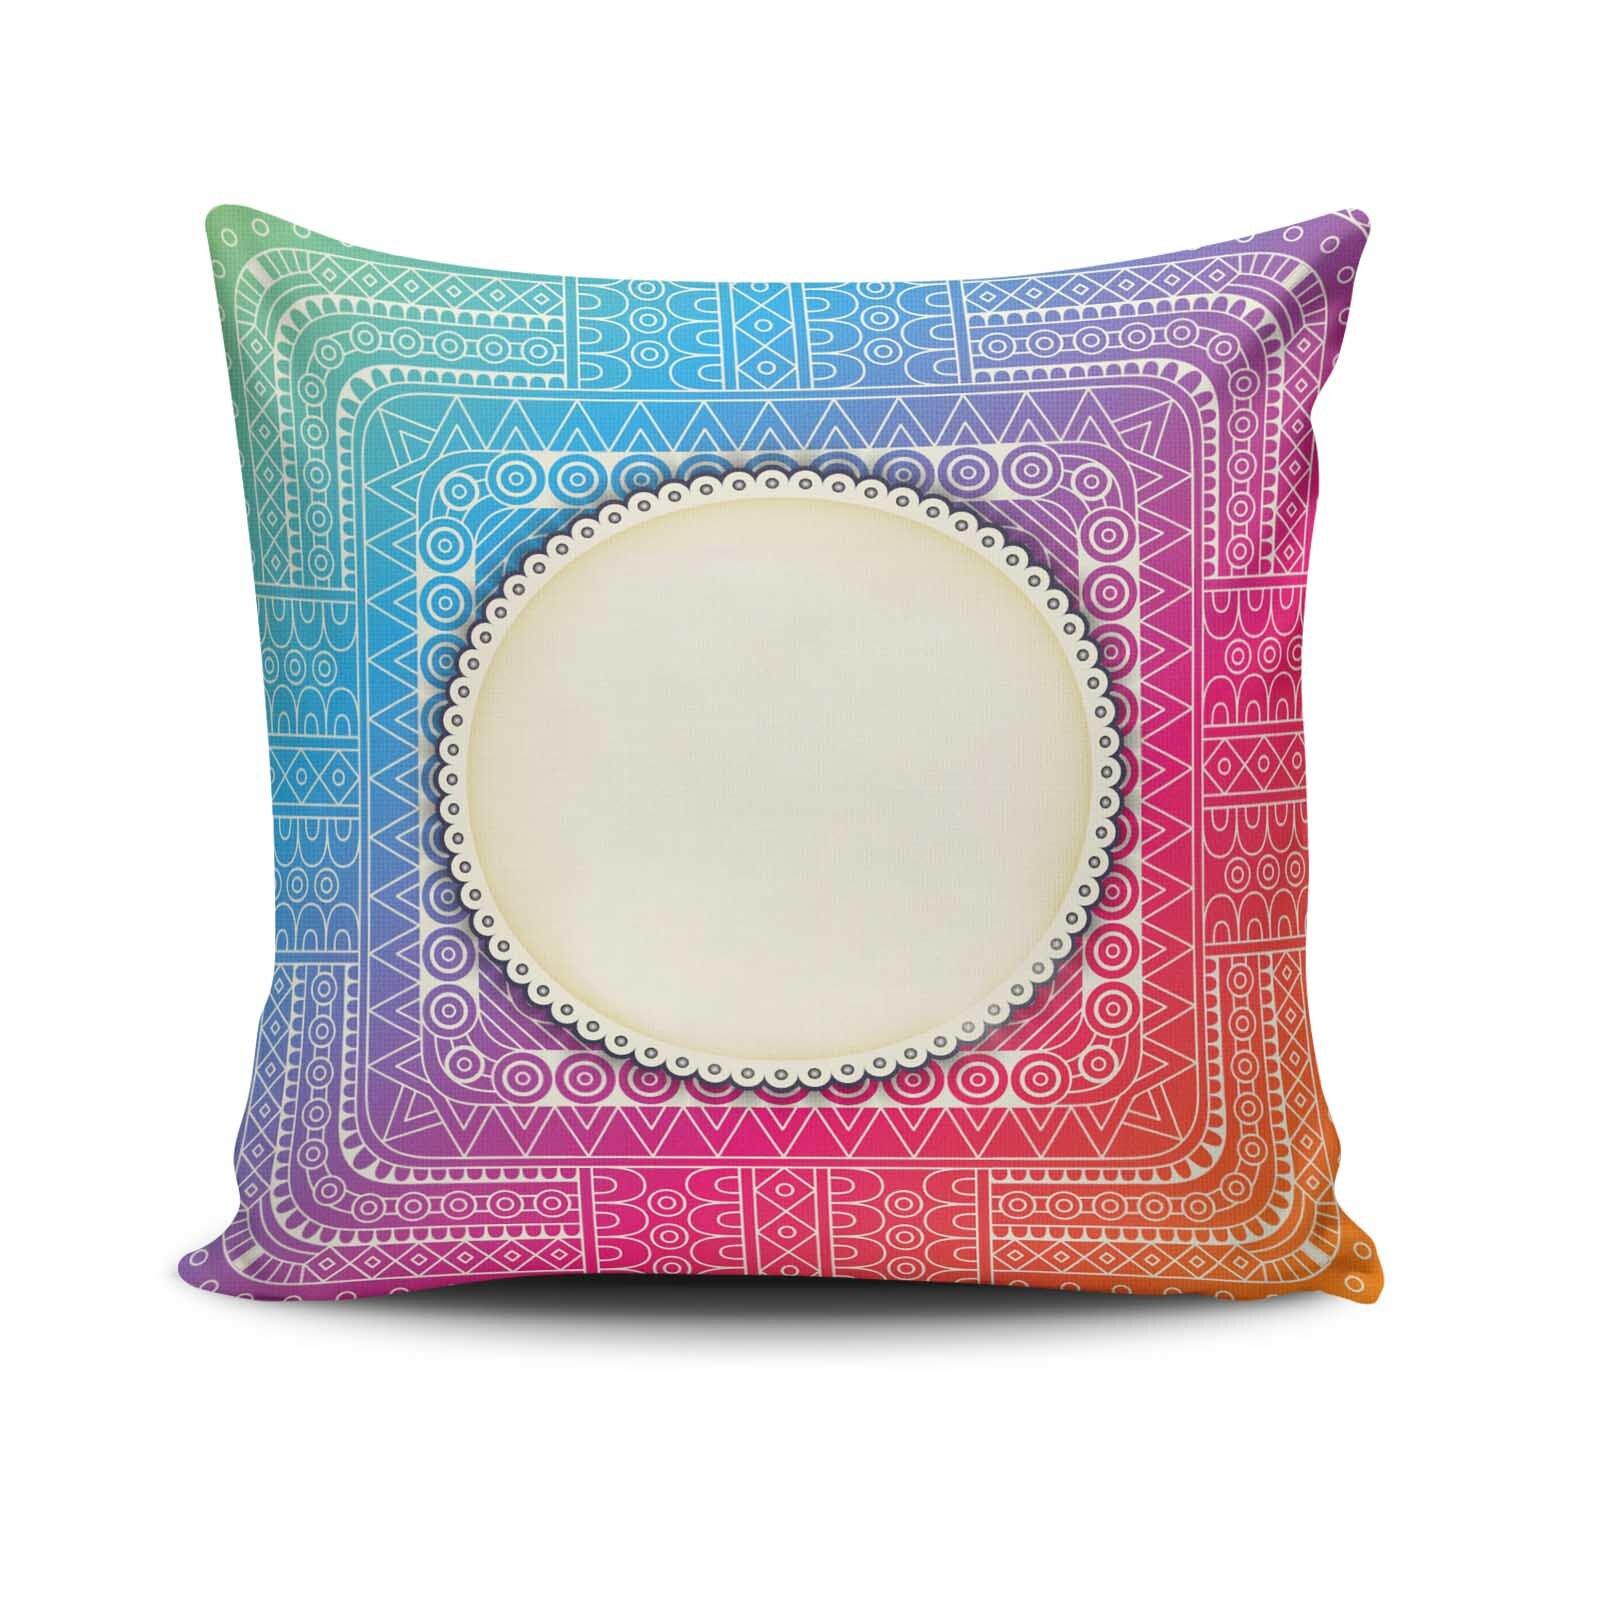 Perna decorativa Cushion Love, Dimensiune: 45 x 45 cm, Material exterior: 50% bumbac / 50% poliester 768CLV0280